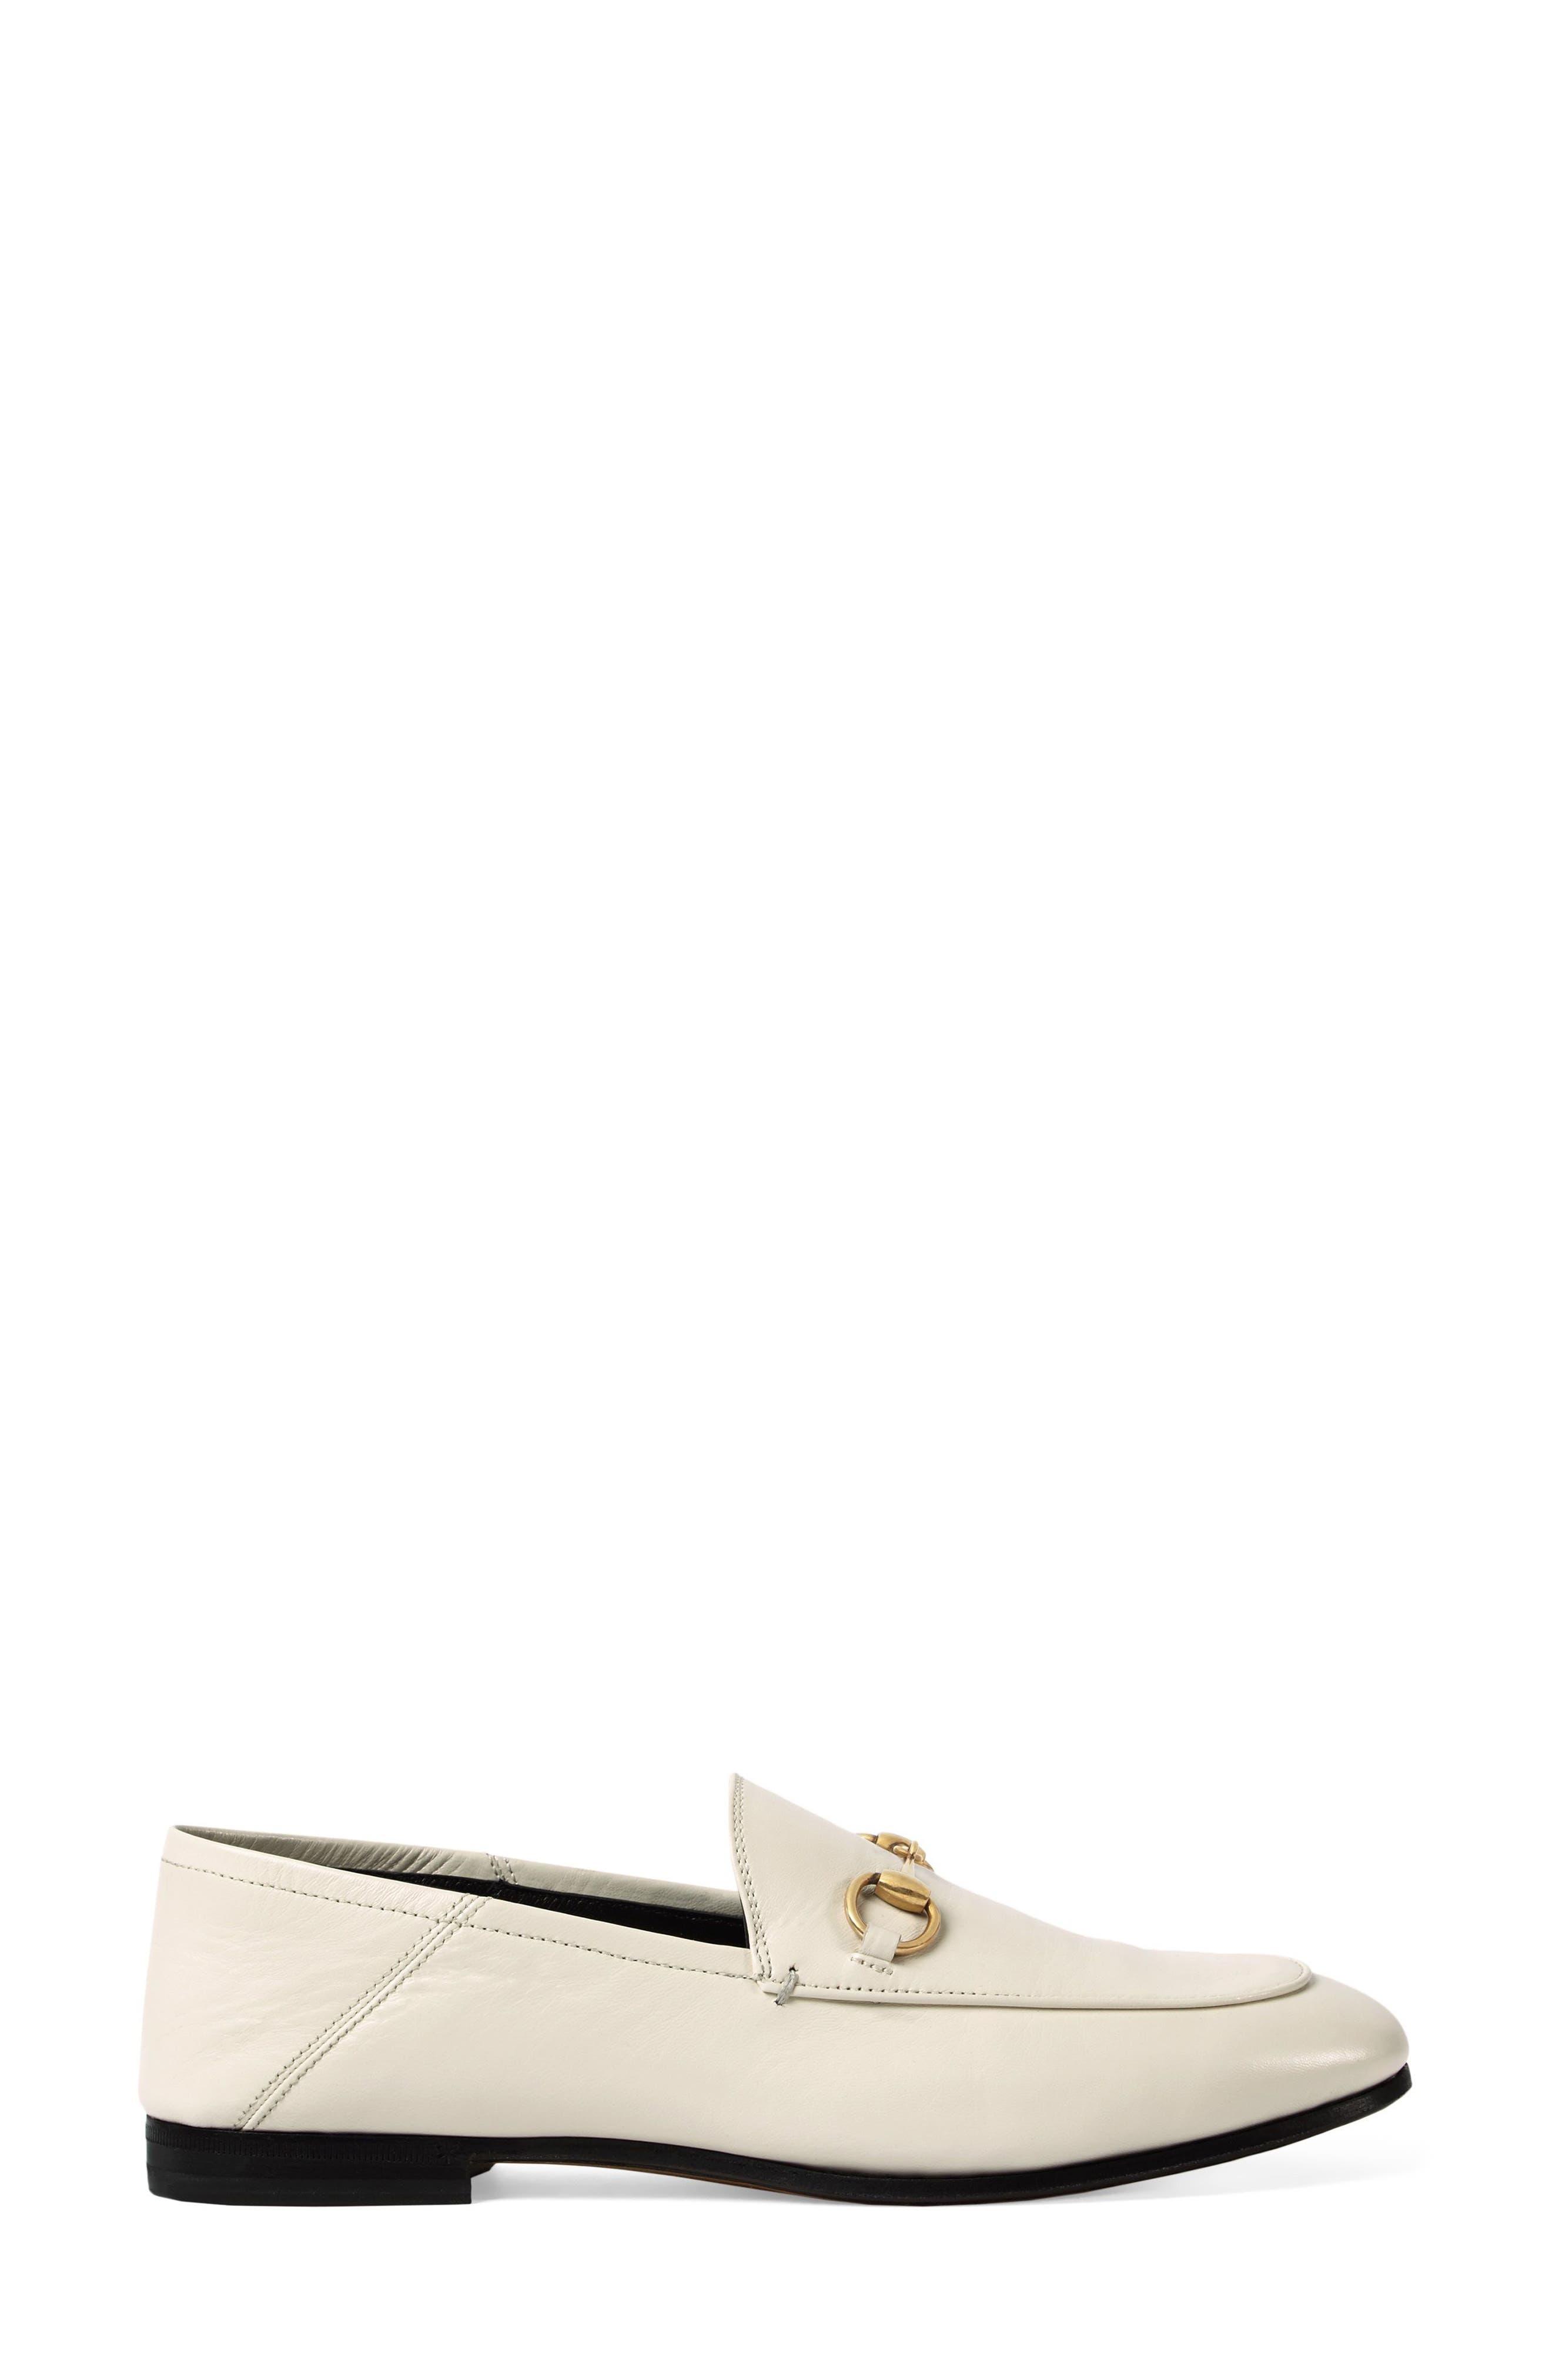 Gucci Brixton Convertible Loafer, White